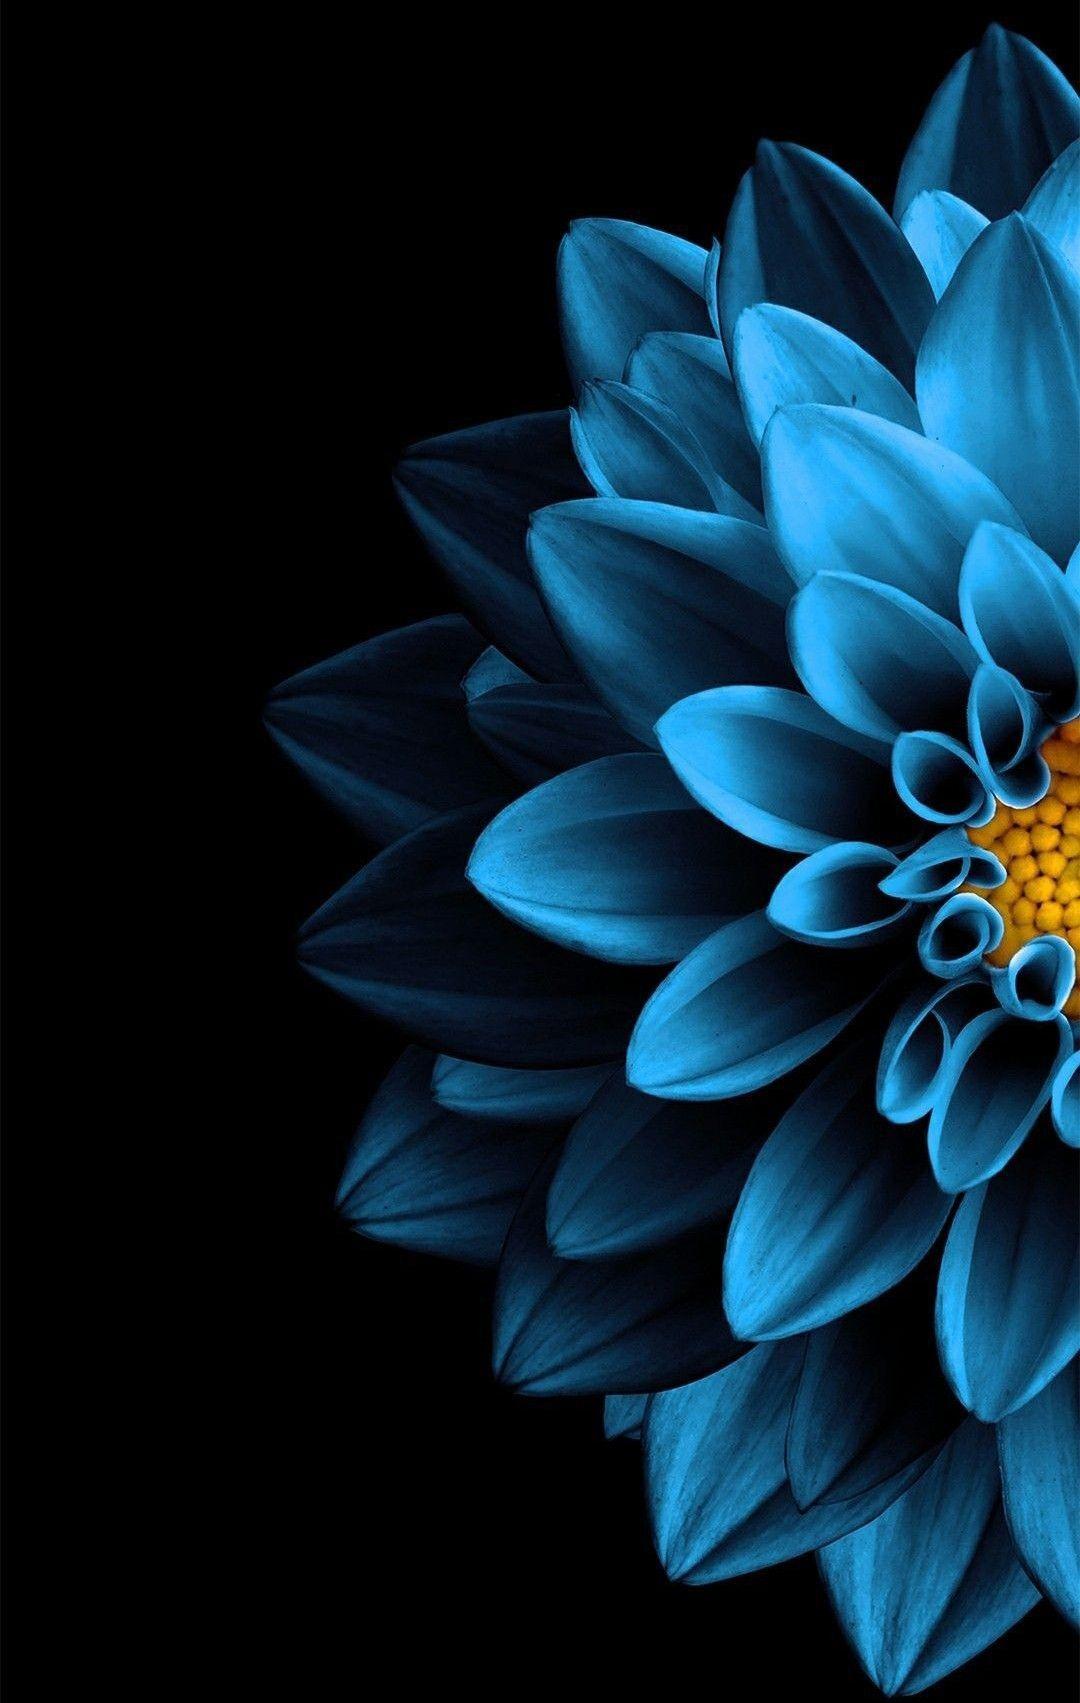 Dark Blue Flower Aesthetic Wallpapers - Wallpaper Cave